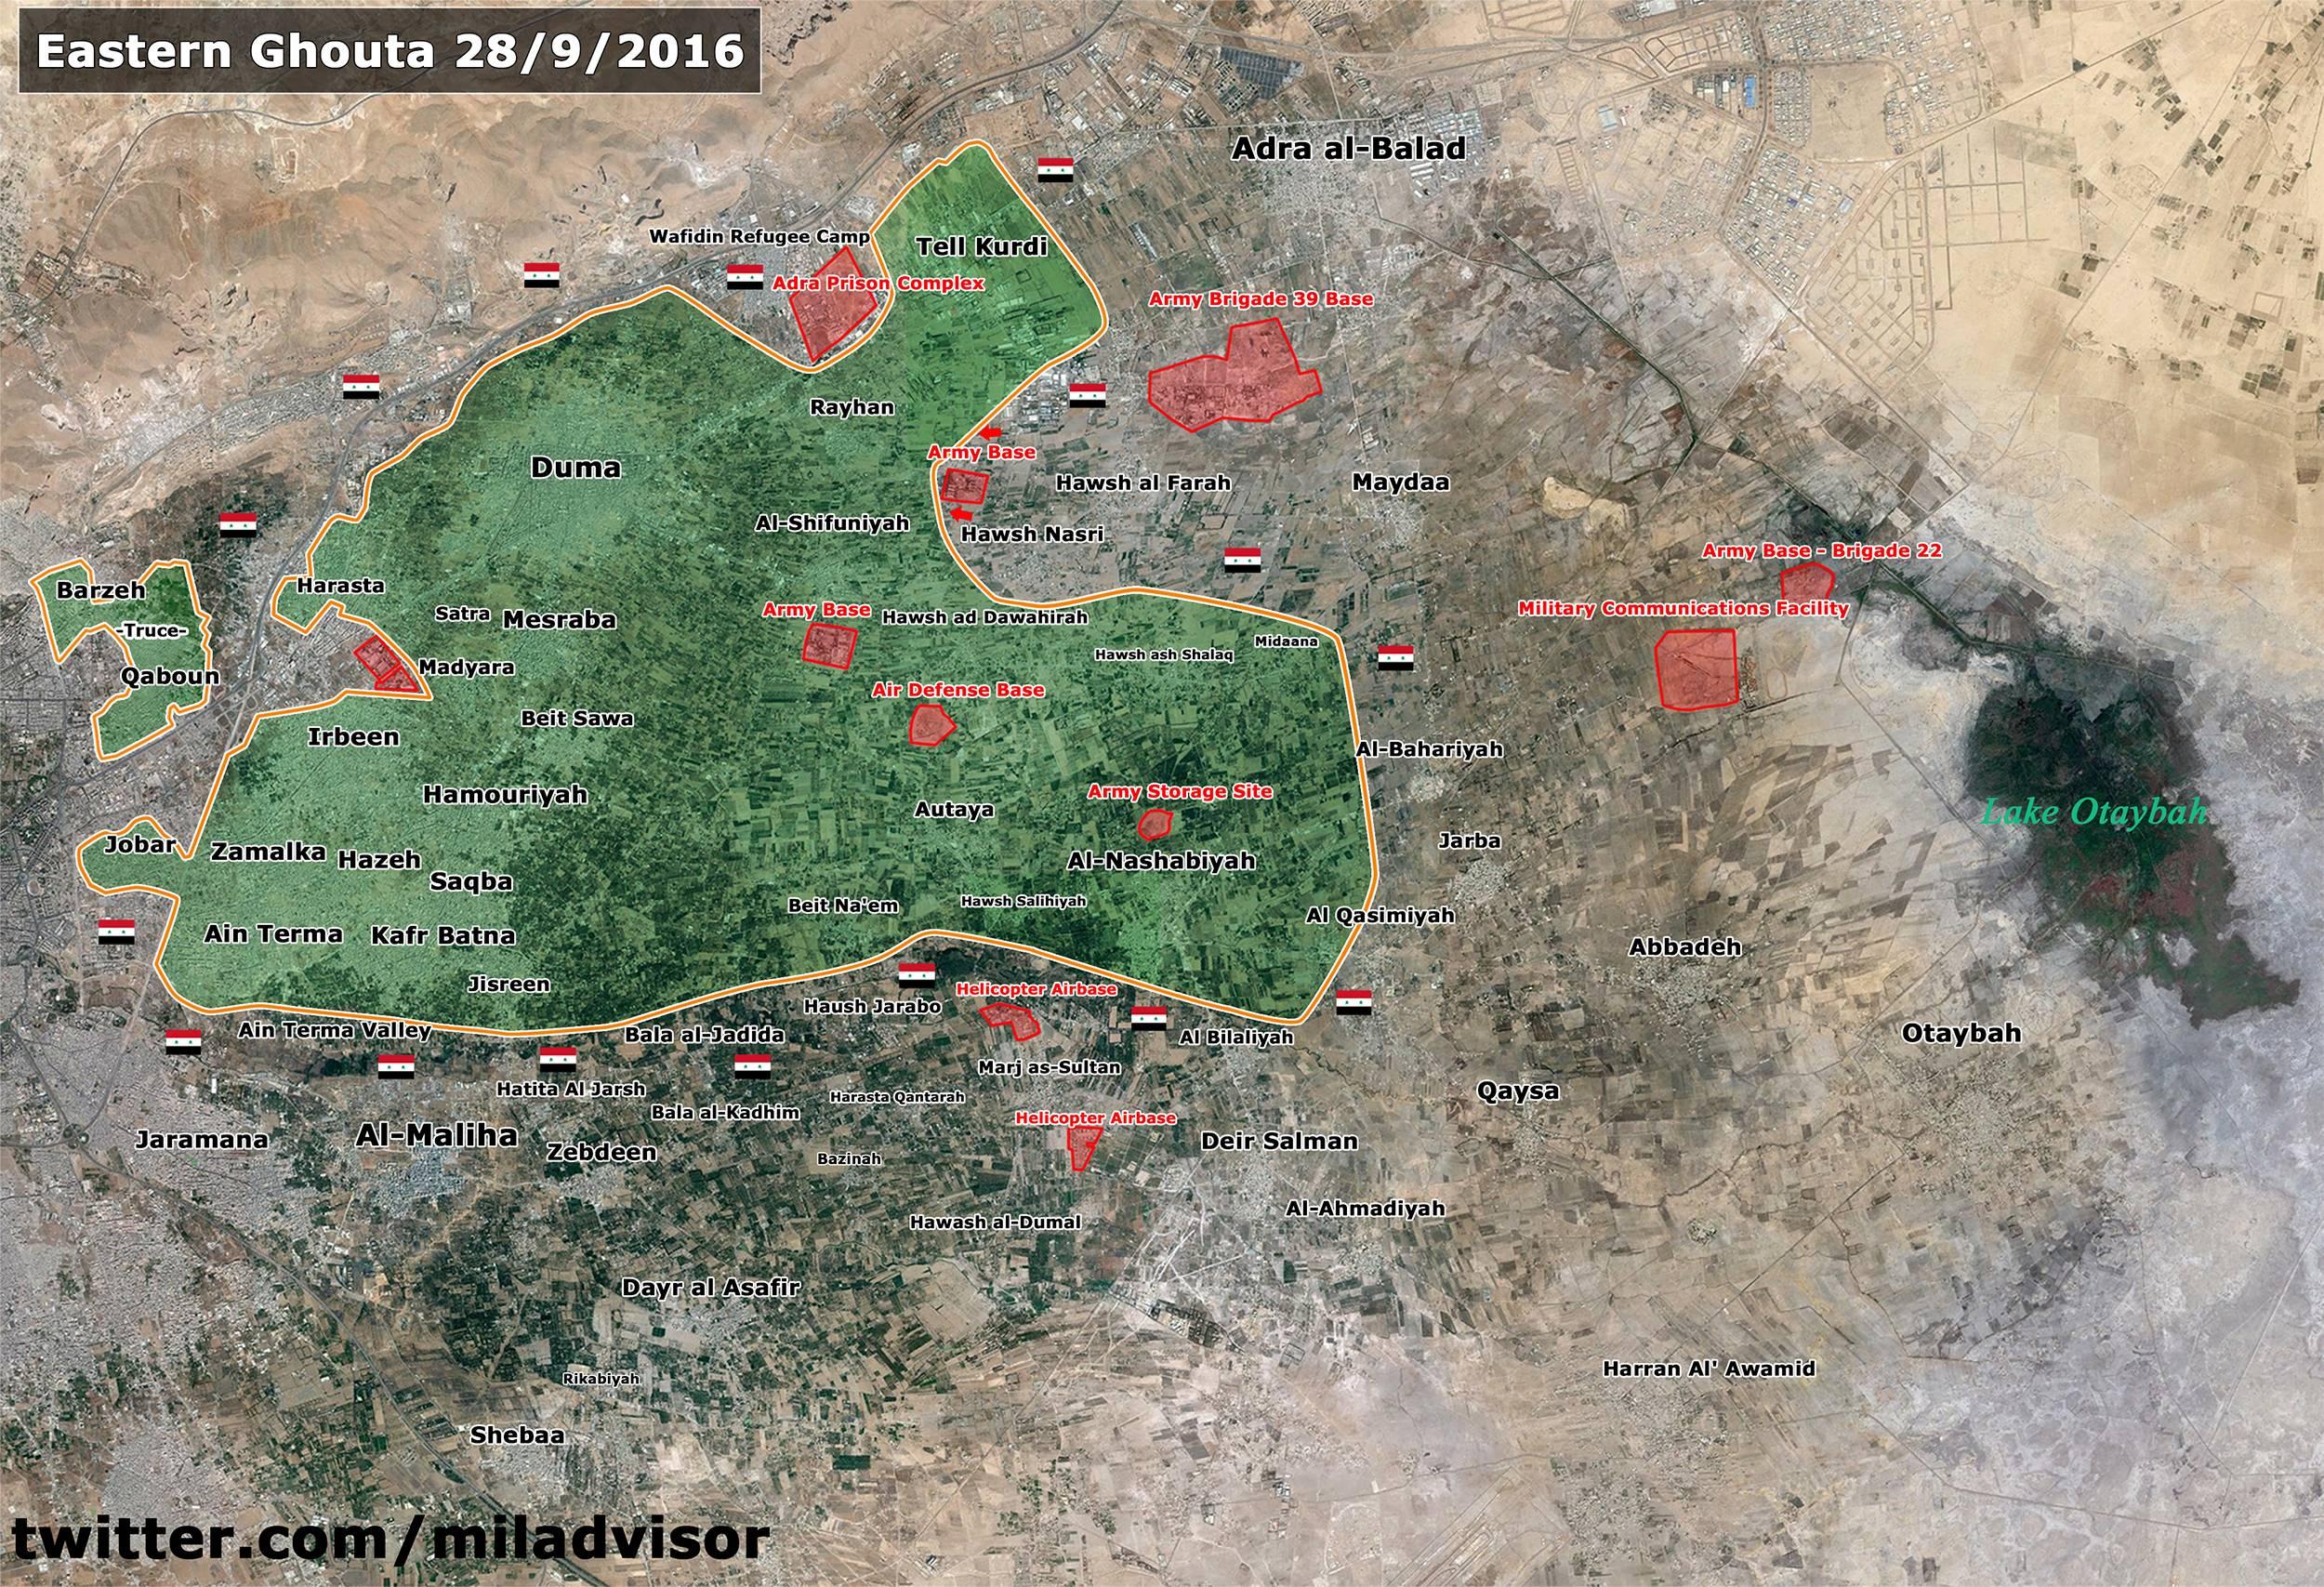 Syrian Army Foils Jaysh al-Islam Counter-Attack, Prepares to Encircle Tell Kurdi in Eastern Ghouta